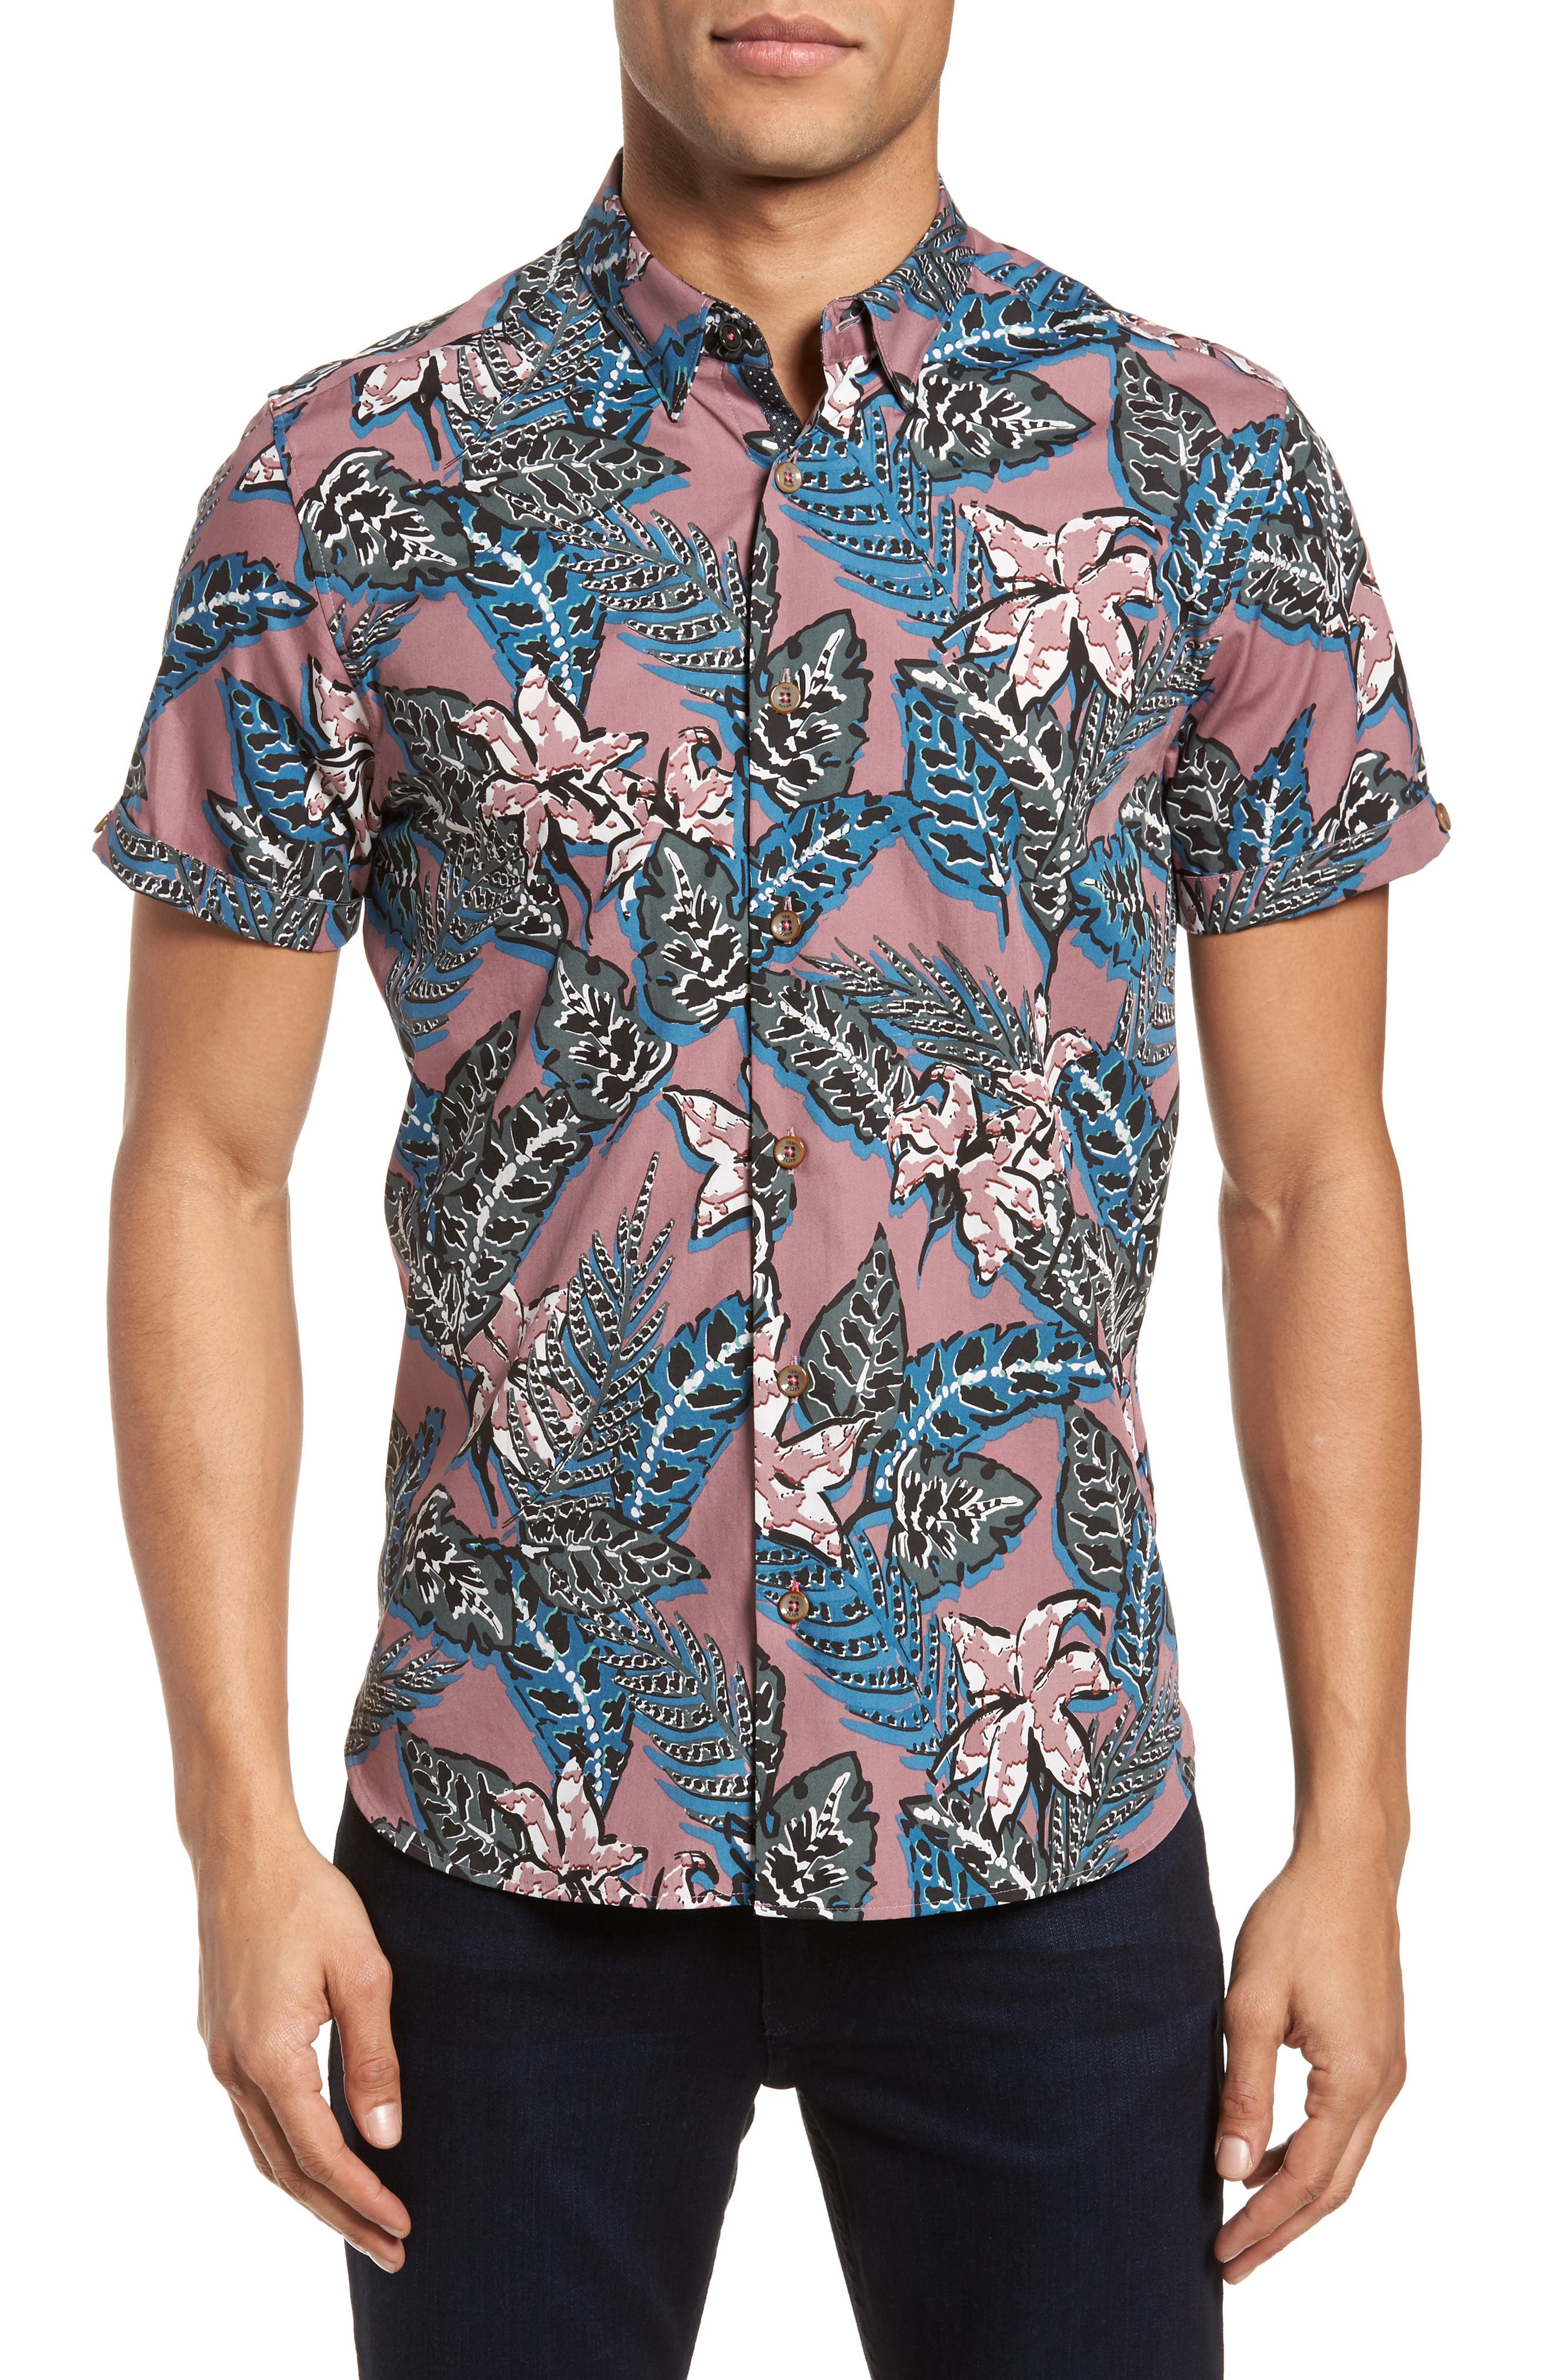 Clbtrop Trim Fit Tropical Woven Shirt,                             Main thumbnail 1, color,                             Pink